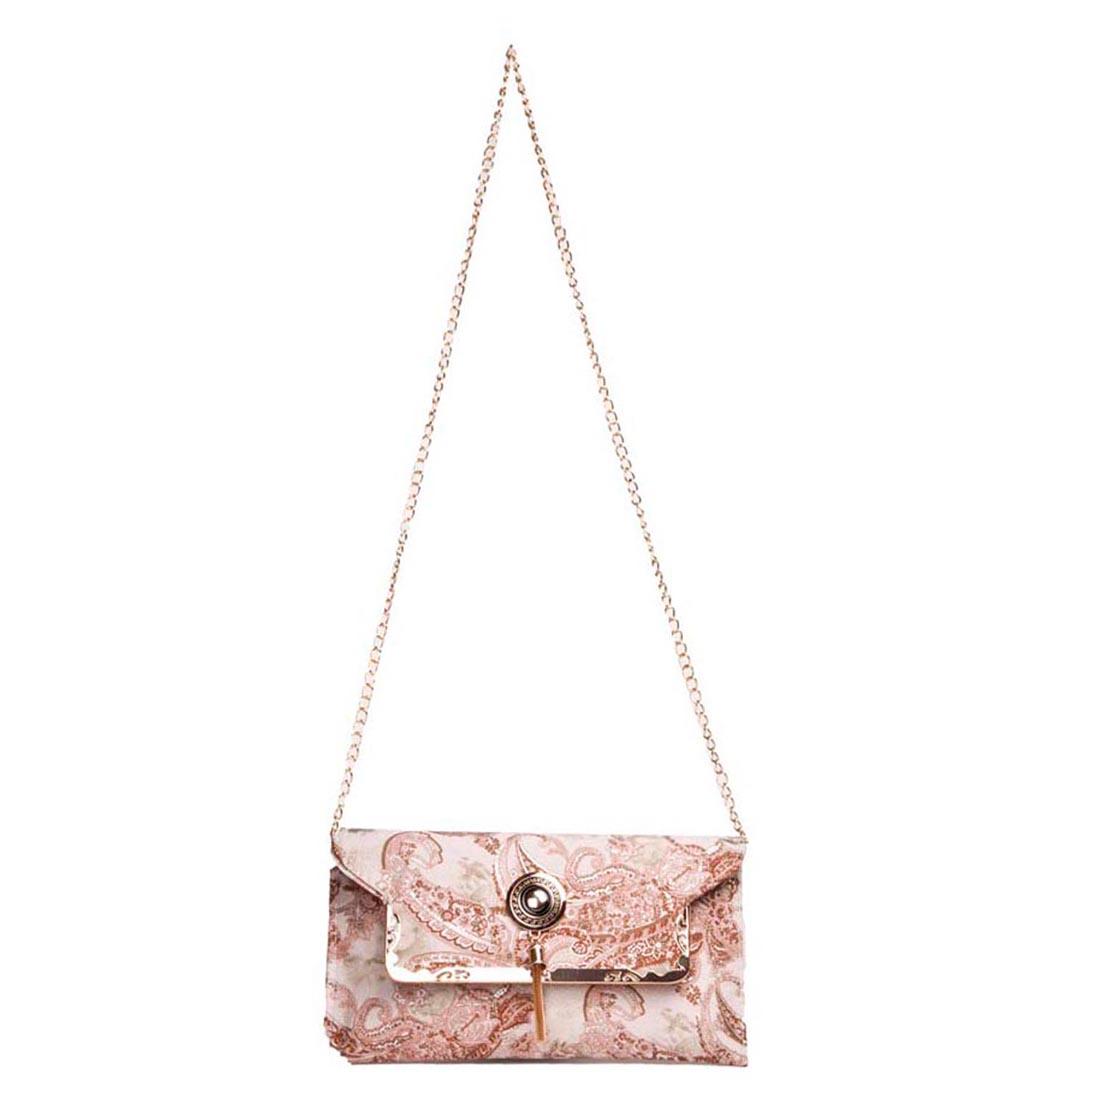 Aliado | Aliado Faux Leather Printed Cream & Brown Magnetic Snap Fold Over Sling Bag